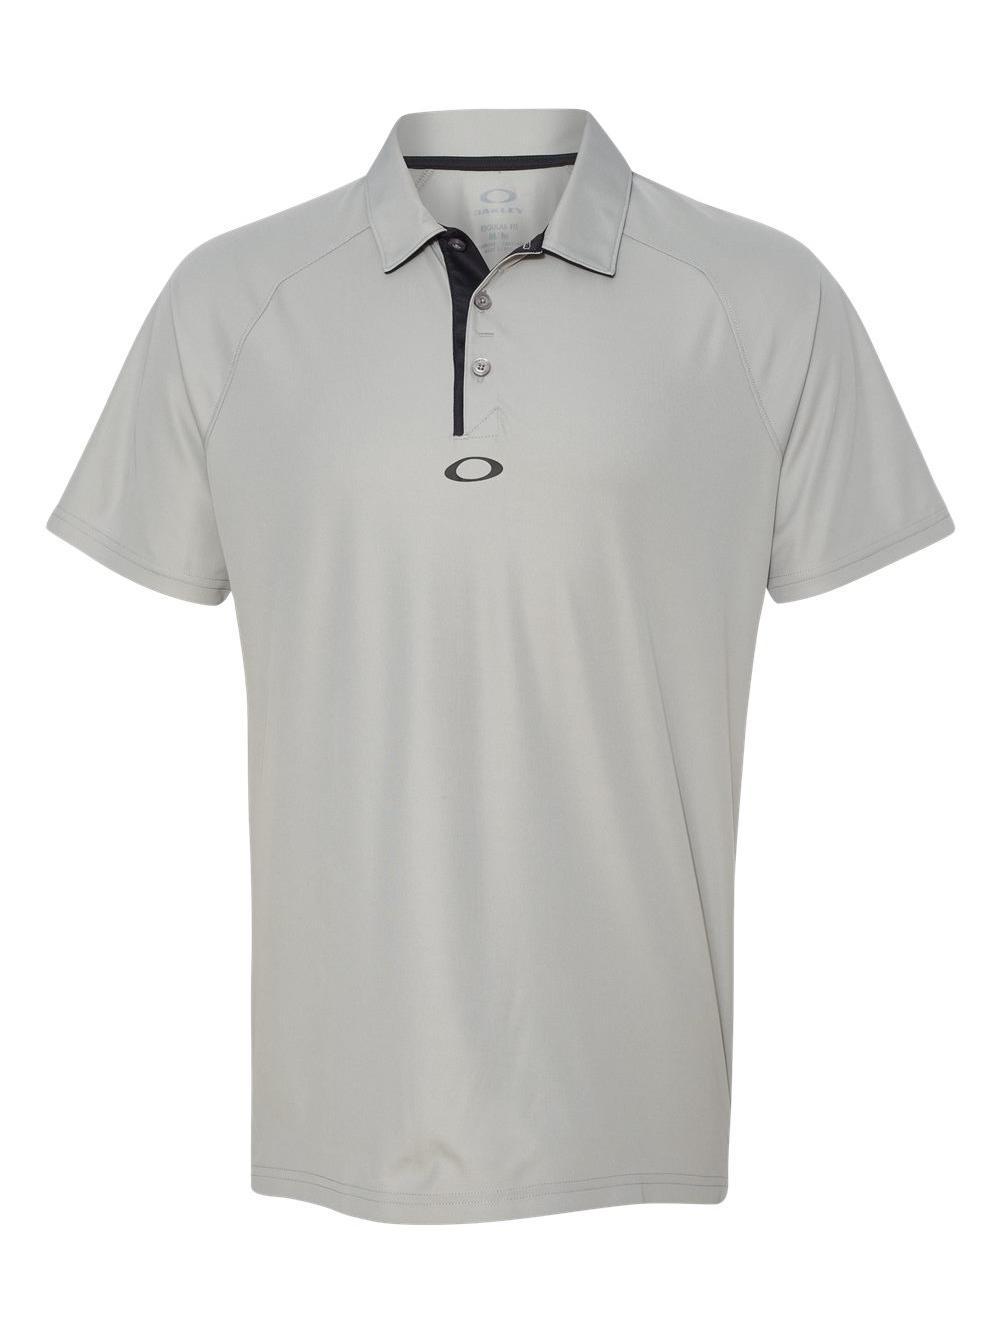 Oakley-Elemental-2-0-Sport-Shirt-432632ODM thumbnail 9